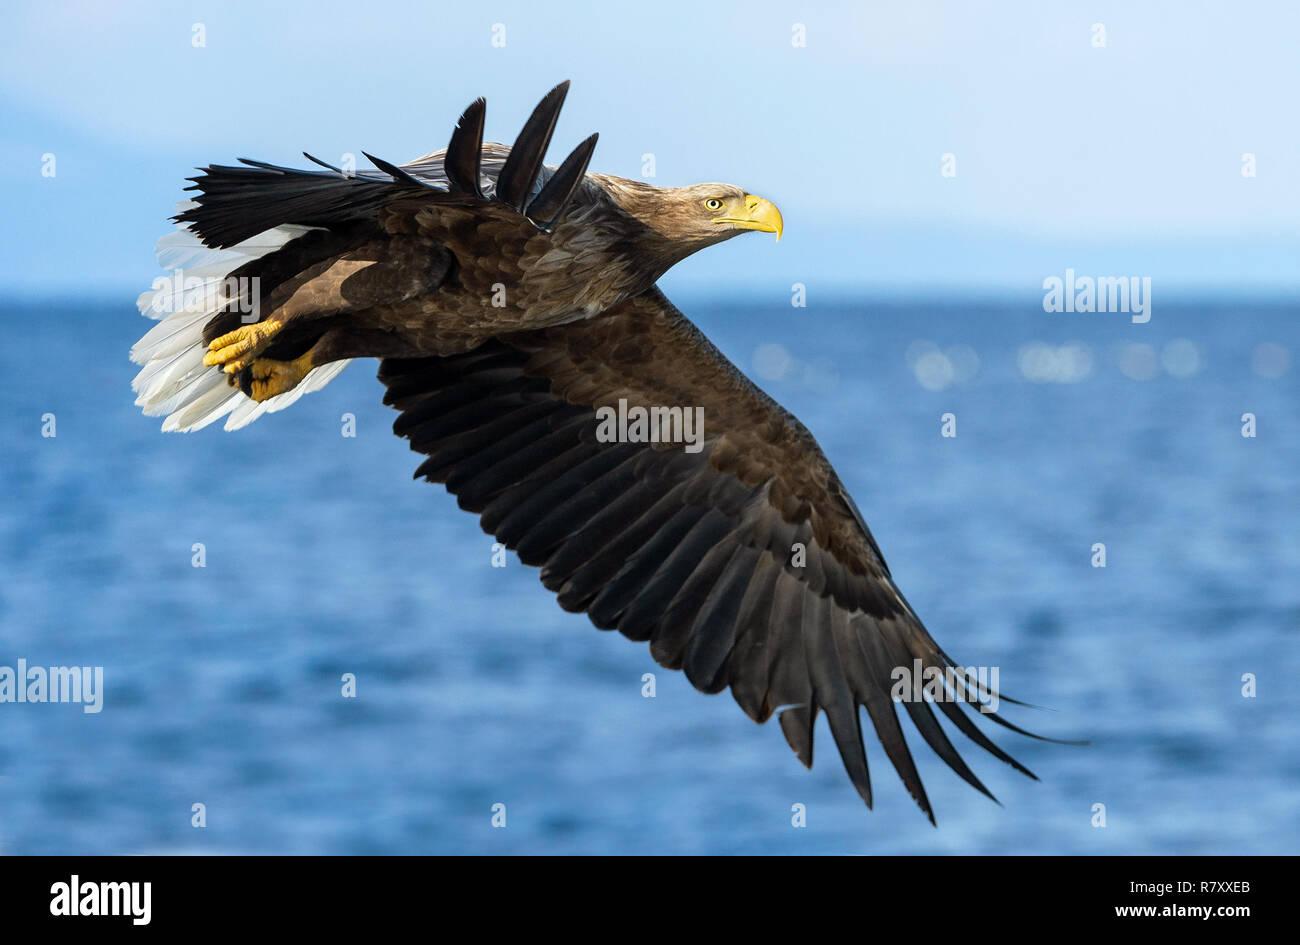 Adult White-tailed eagles fishing. Blue Ocean  background. Scientific name: Haliaeetus albicilla, also known as the ern, erne, gray eagle, Eurasian se Stock Photo